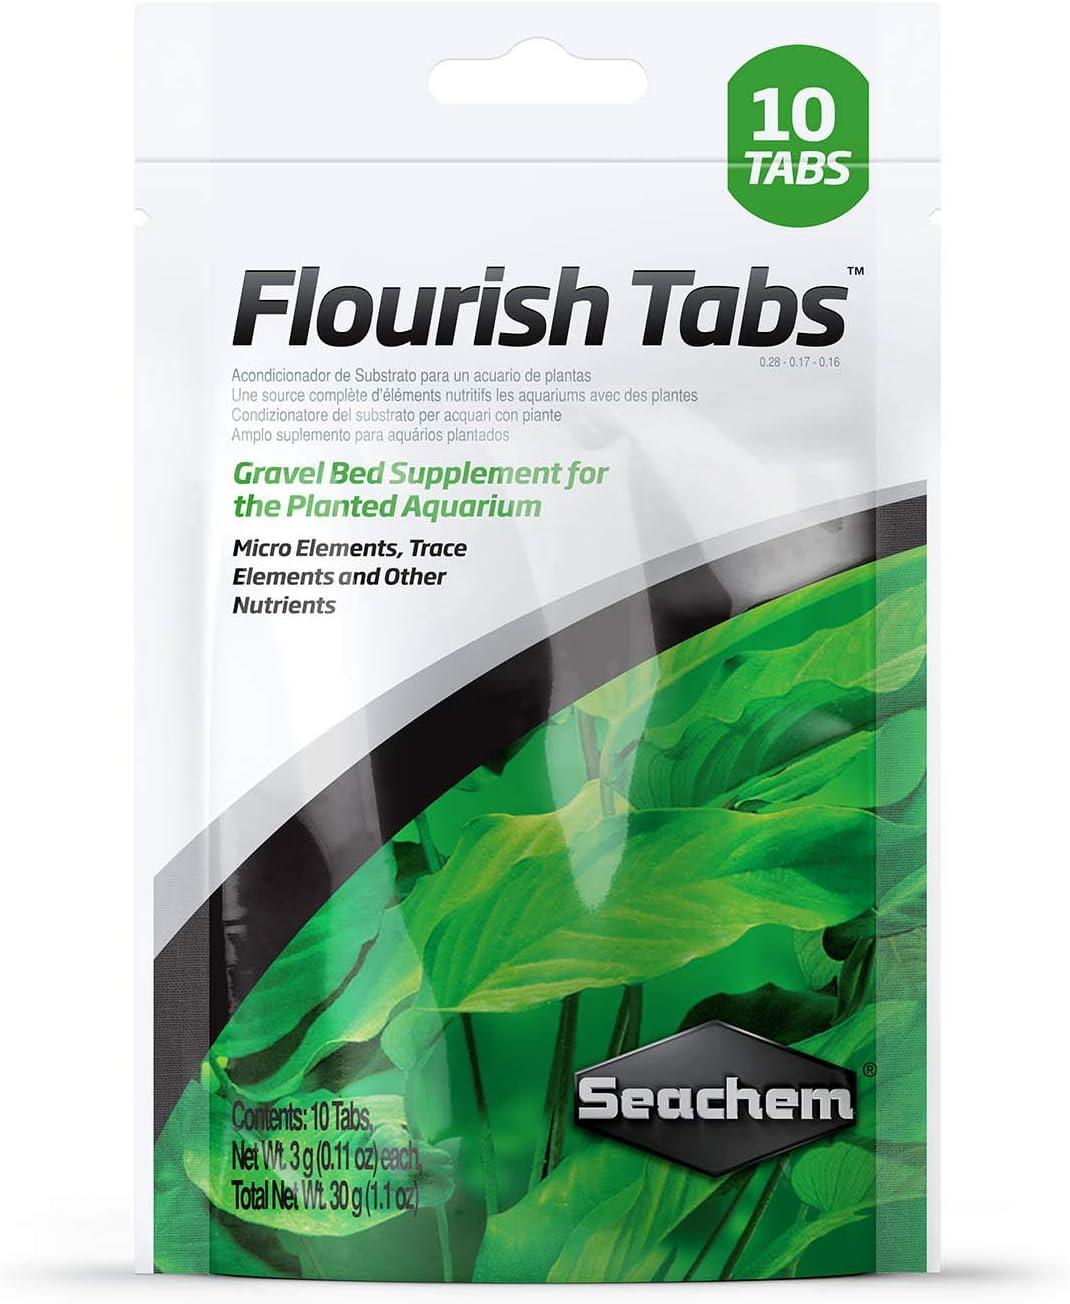 Ranking TOP10 Seachem Flourish Tabs Growth Supplement Plant - Time sale Stimulan Aquatic